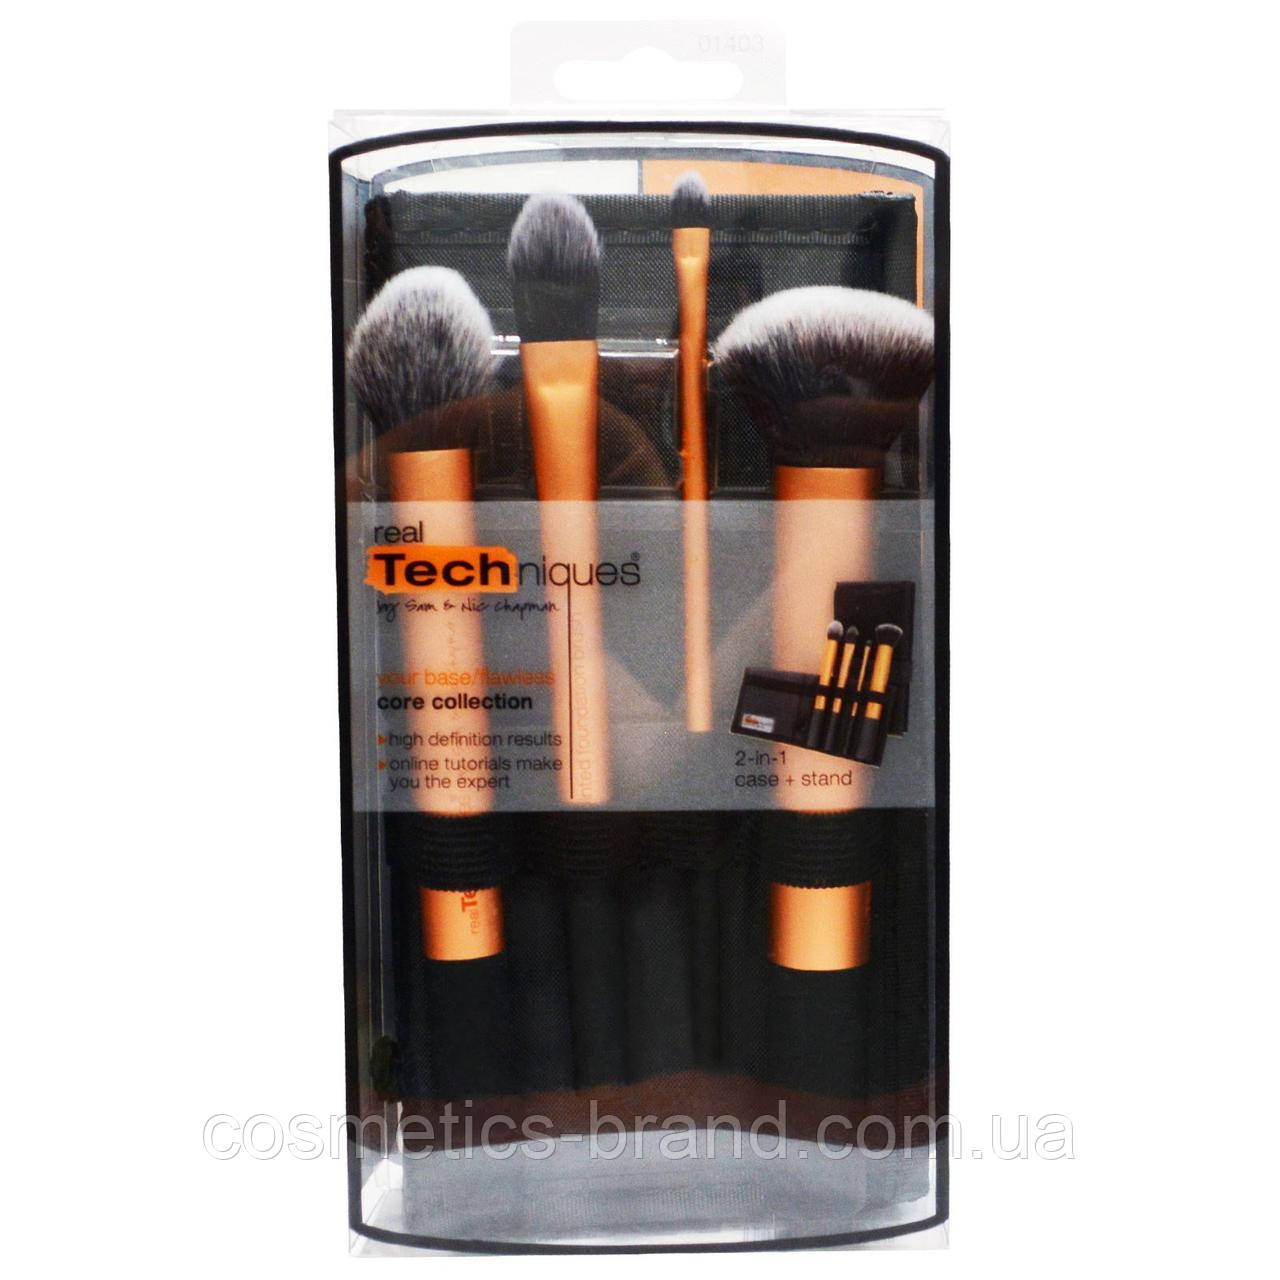 Кисти для макияжа Real Techniques Core Collection (4 предмета) (реплика)